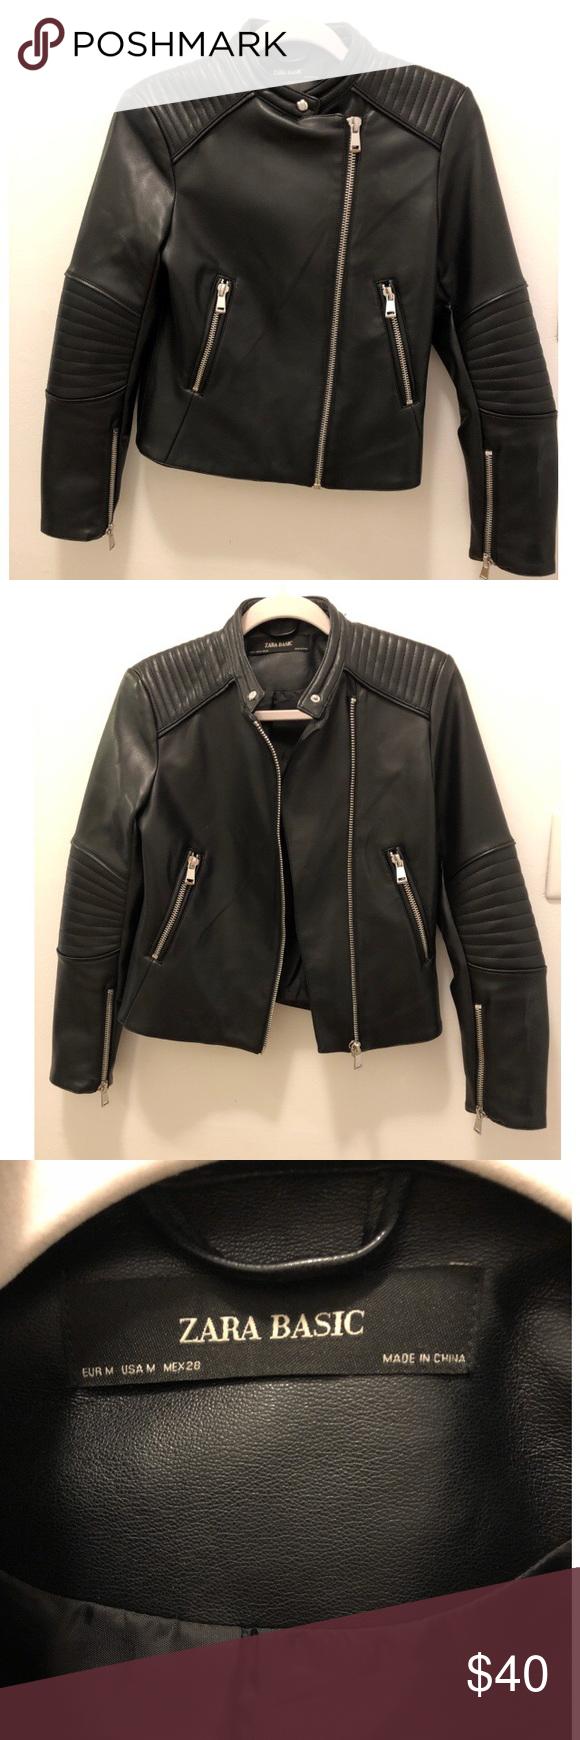 Zara biker jacket Zara biker jacket, Zara, Jackets